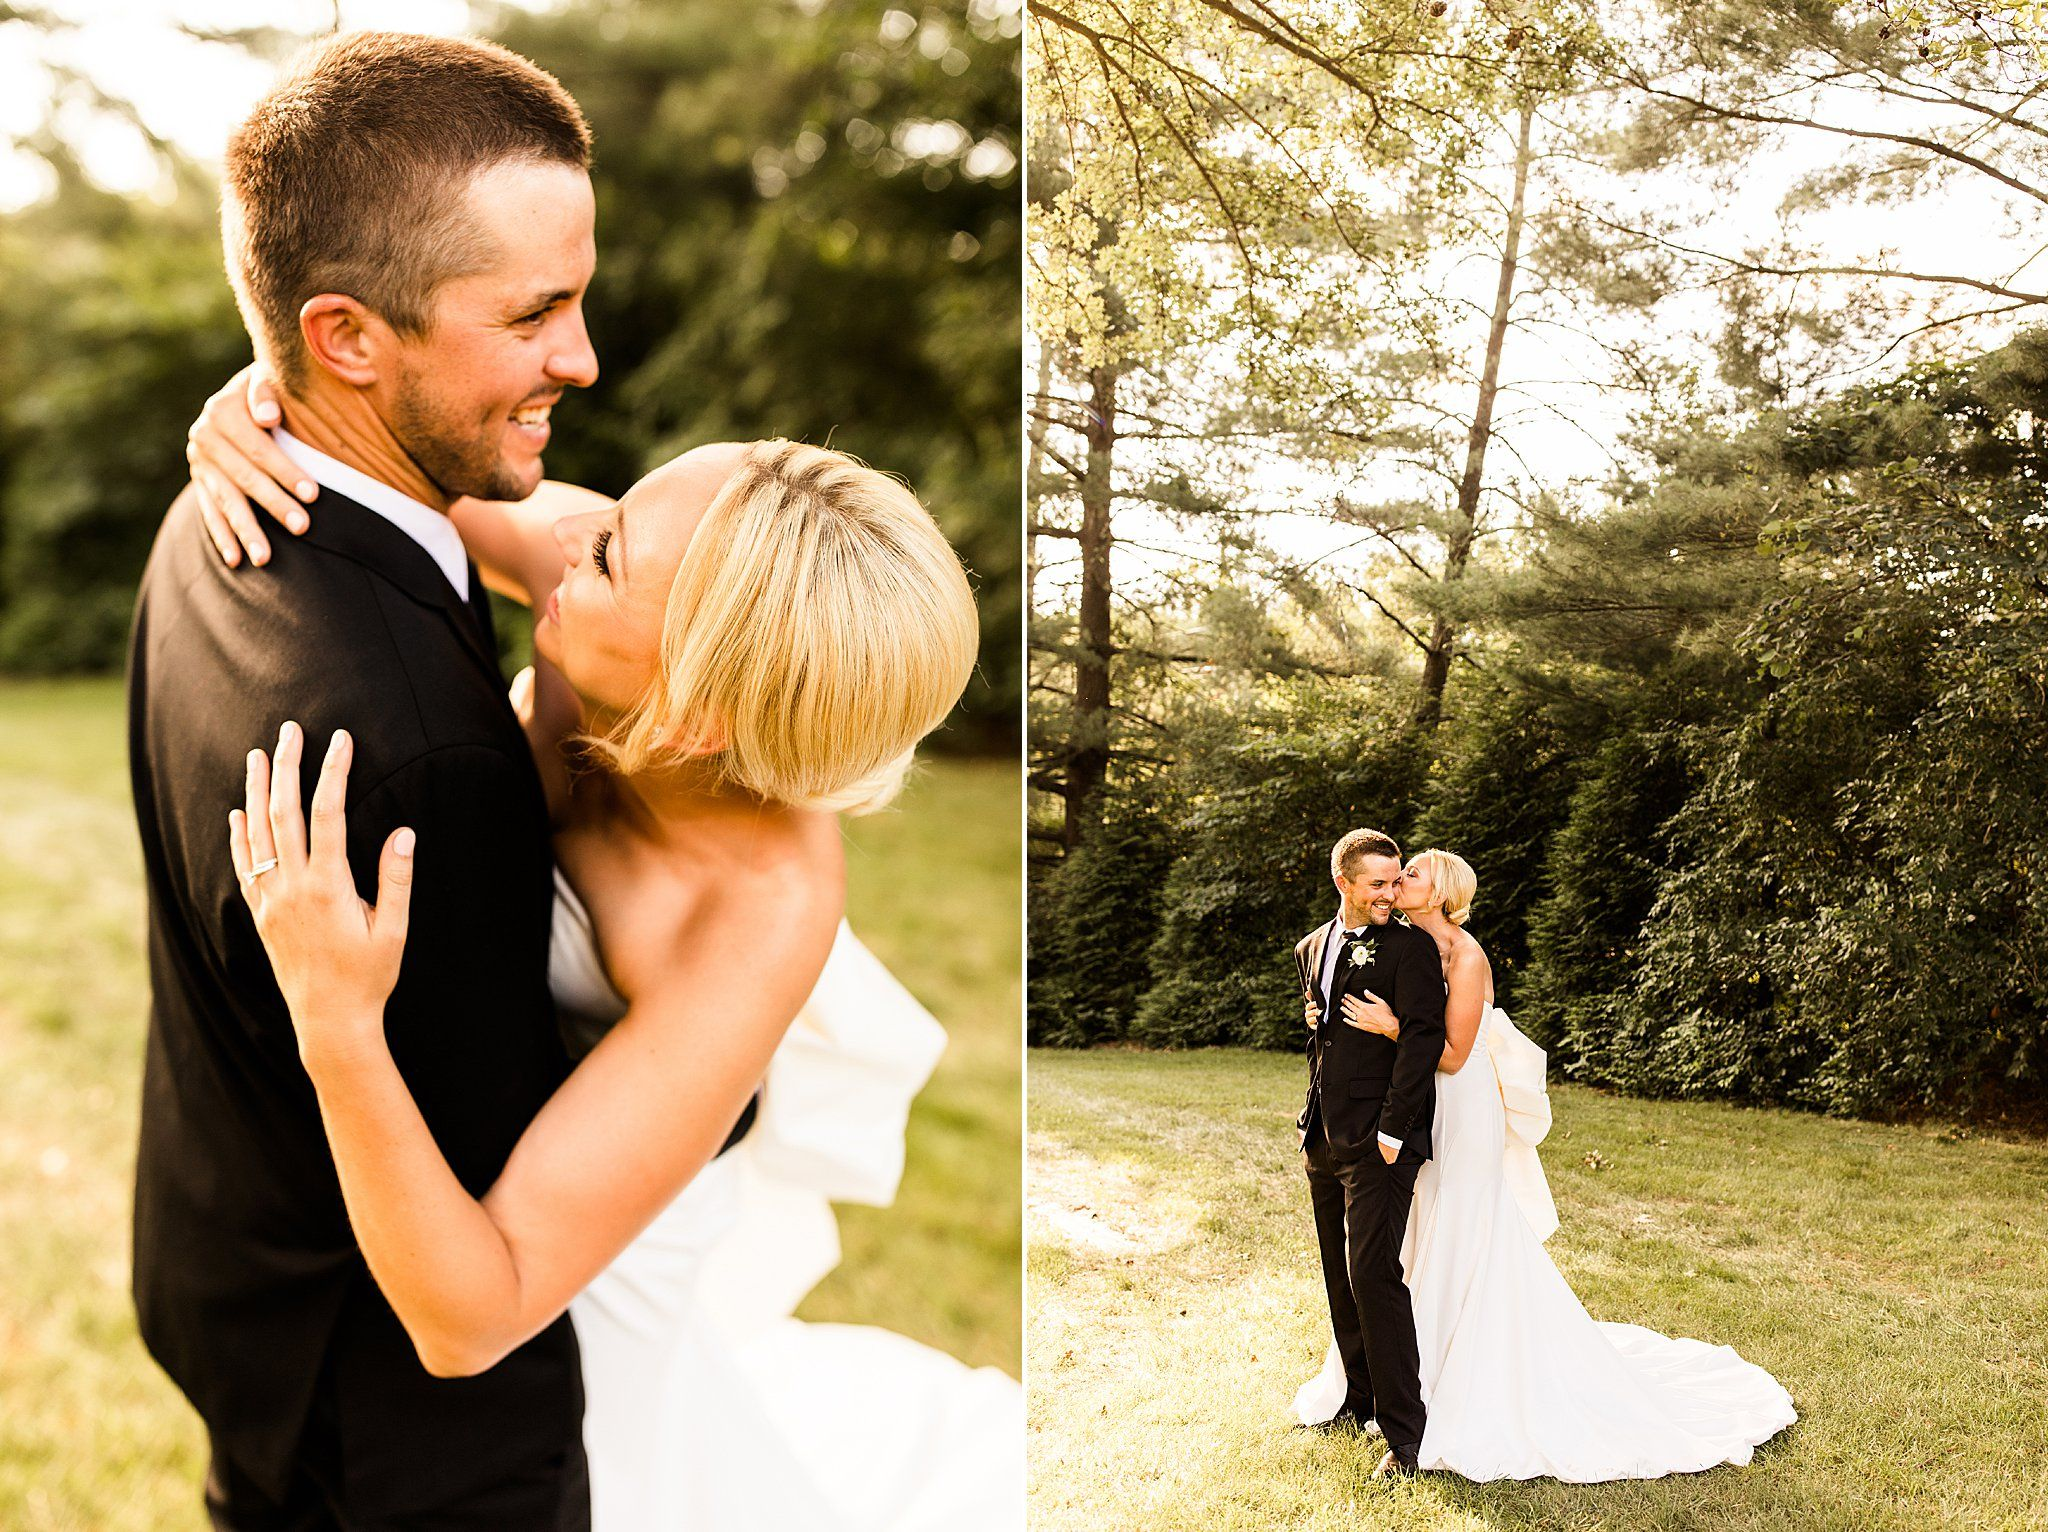 Mike Alyssa Elegant Backyard St Louis Wedding St Louis Wedding Photography Jessica Lauren Photography Wedding Details Photography Wedding Couples Photography St Louis Wedding